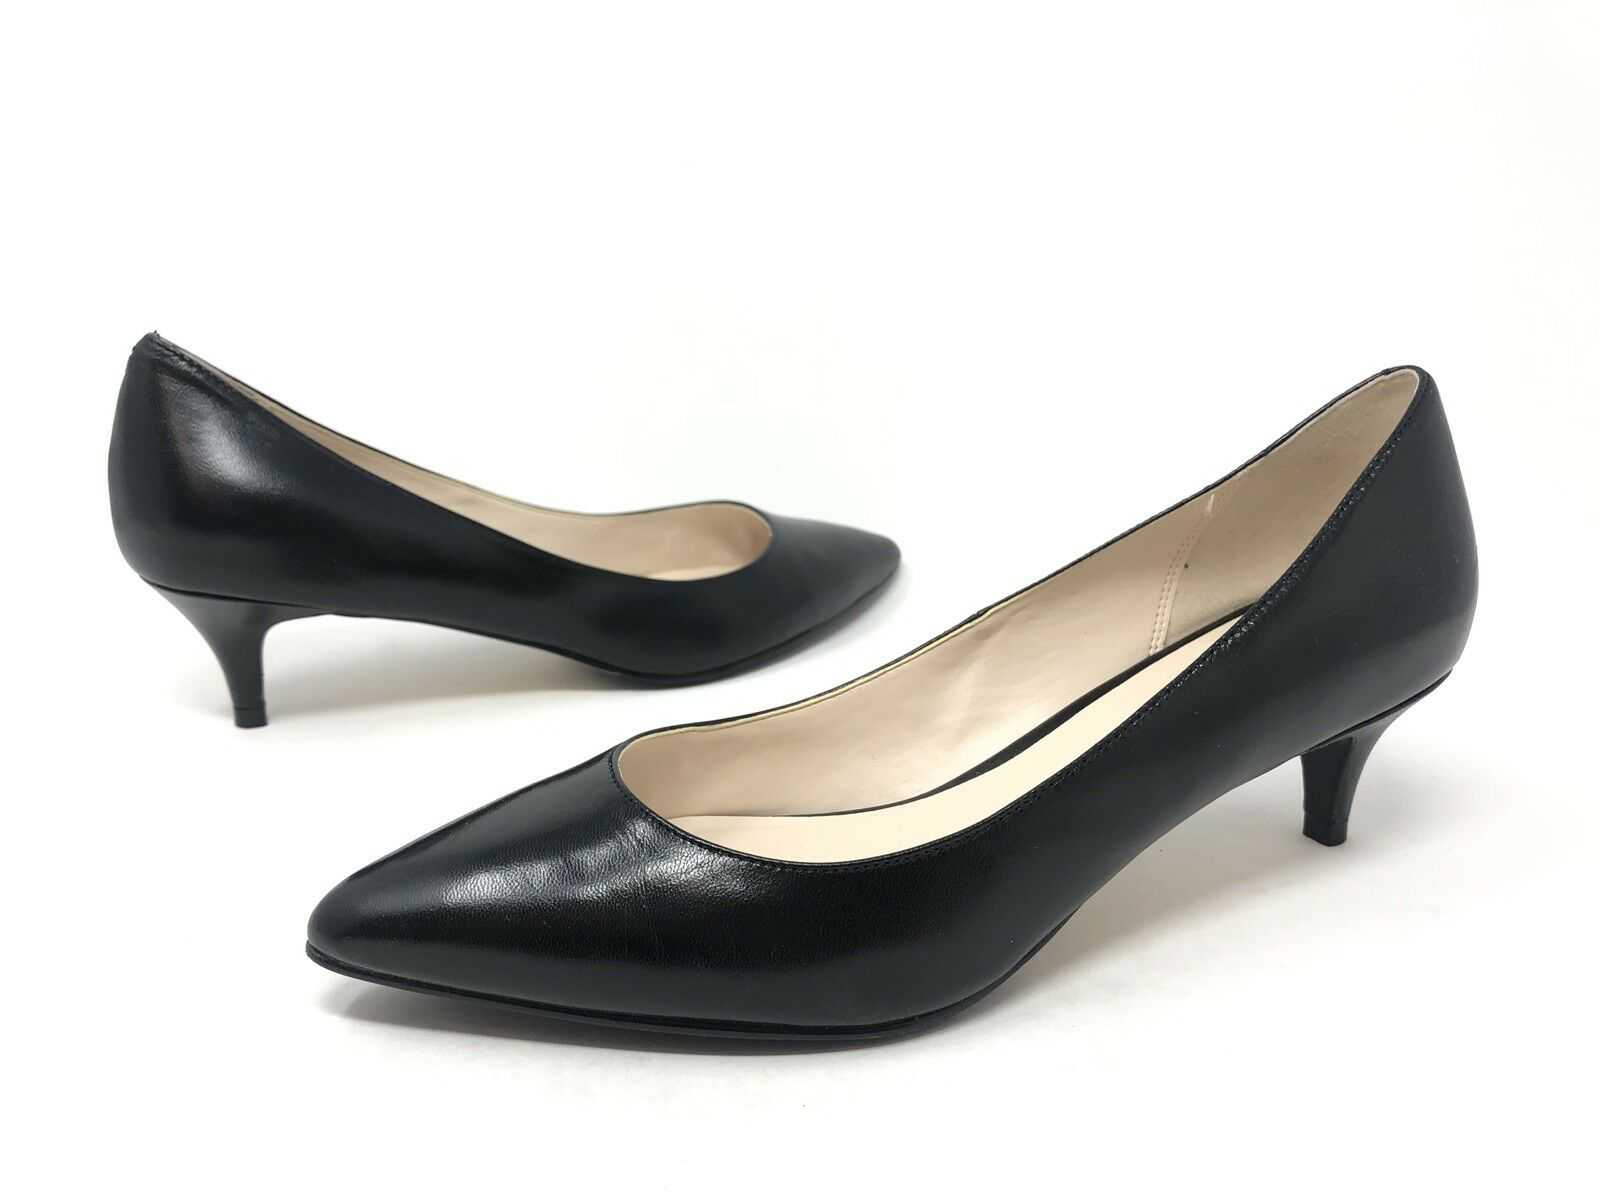 030 Cole Haan Women's Juliana 45mm 45mm 45mm Dress Pumps, Black, Size 7.5 M 1de20f